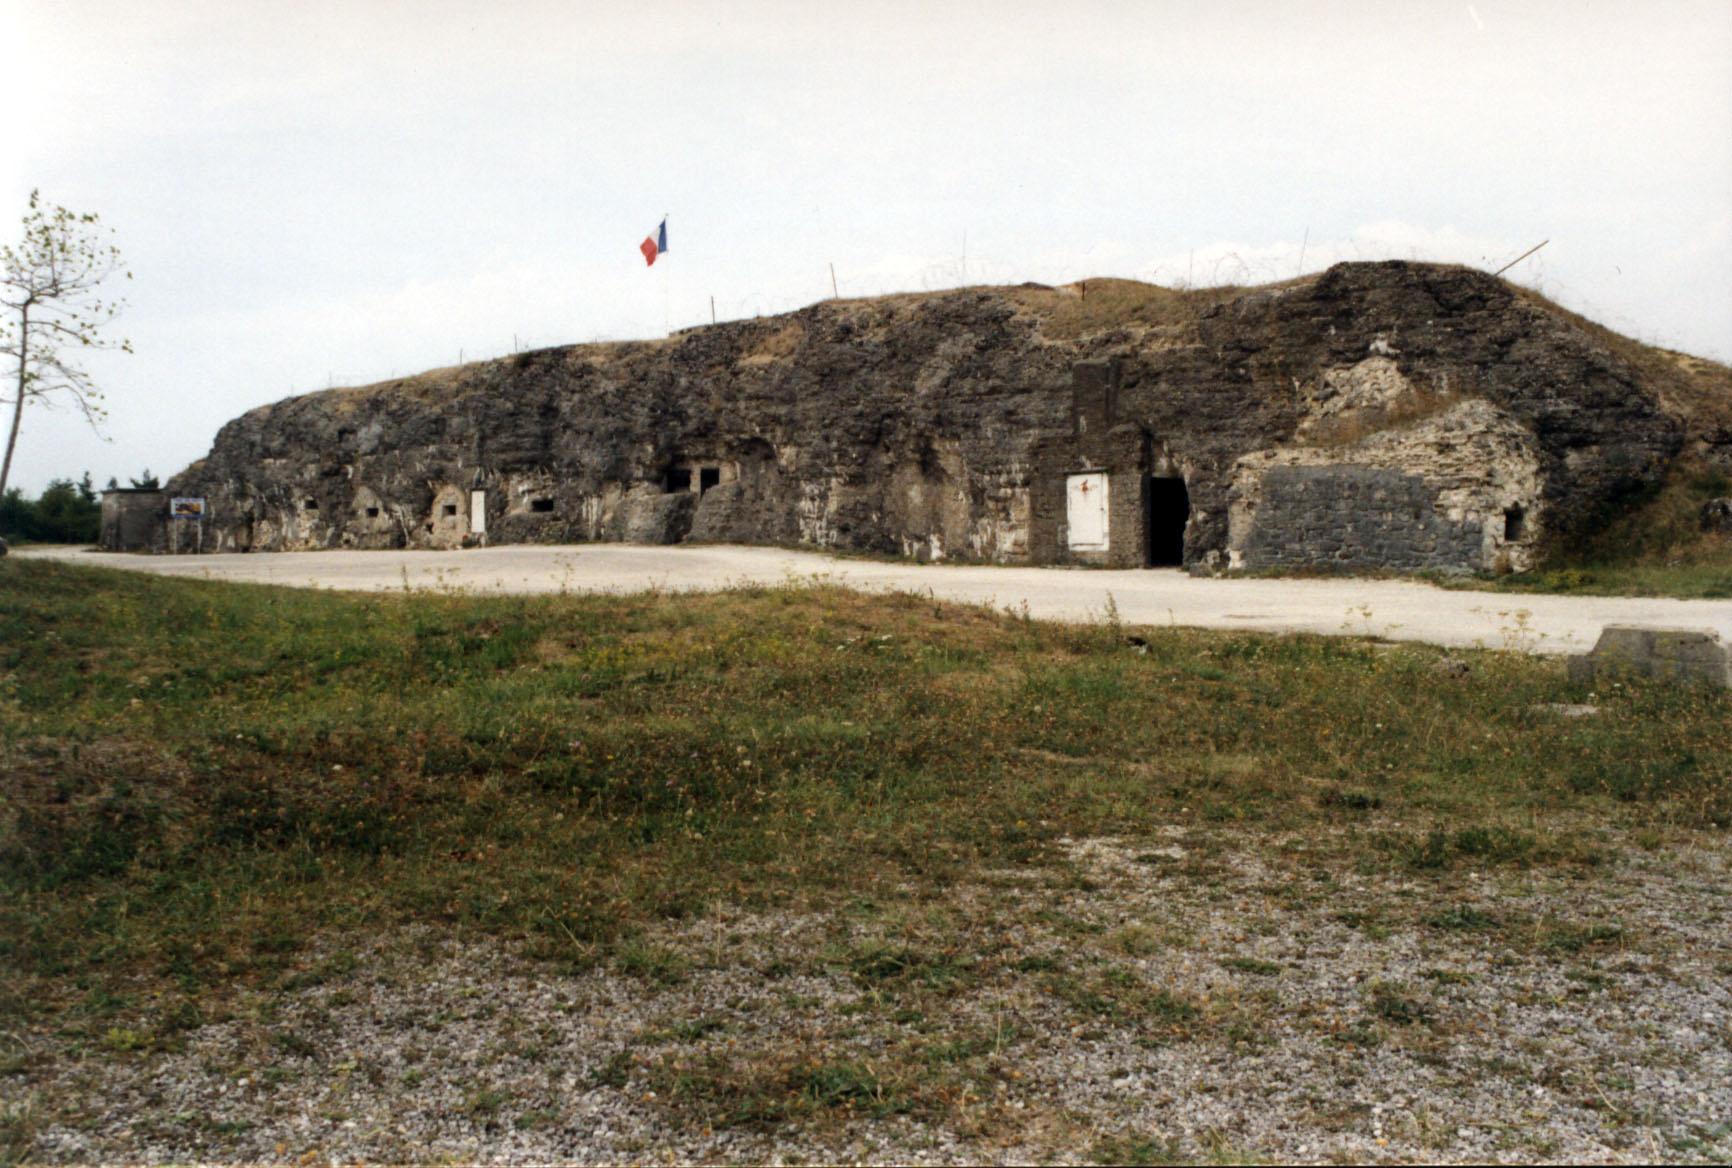 Fort Vaux, Verdun, France